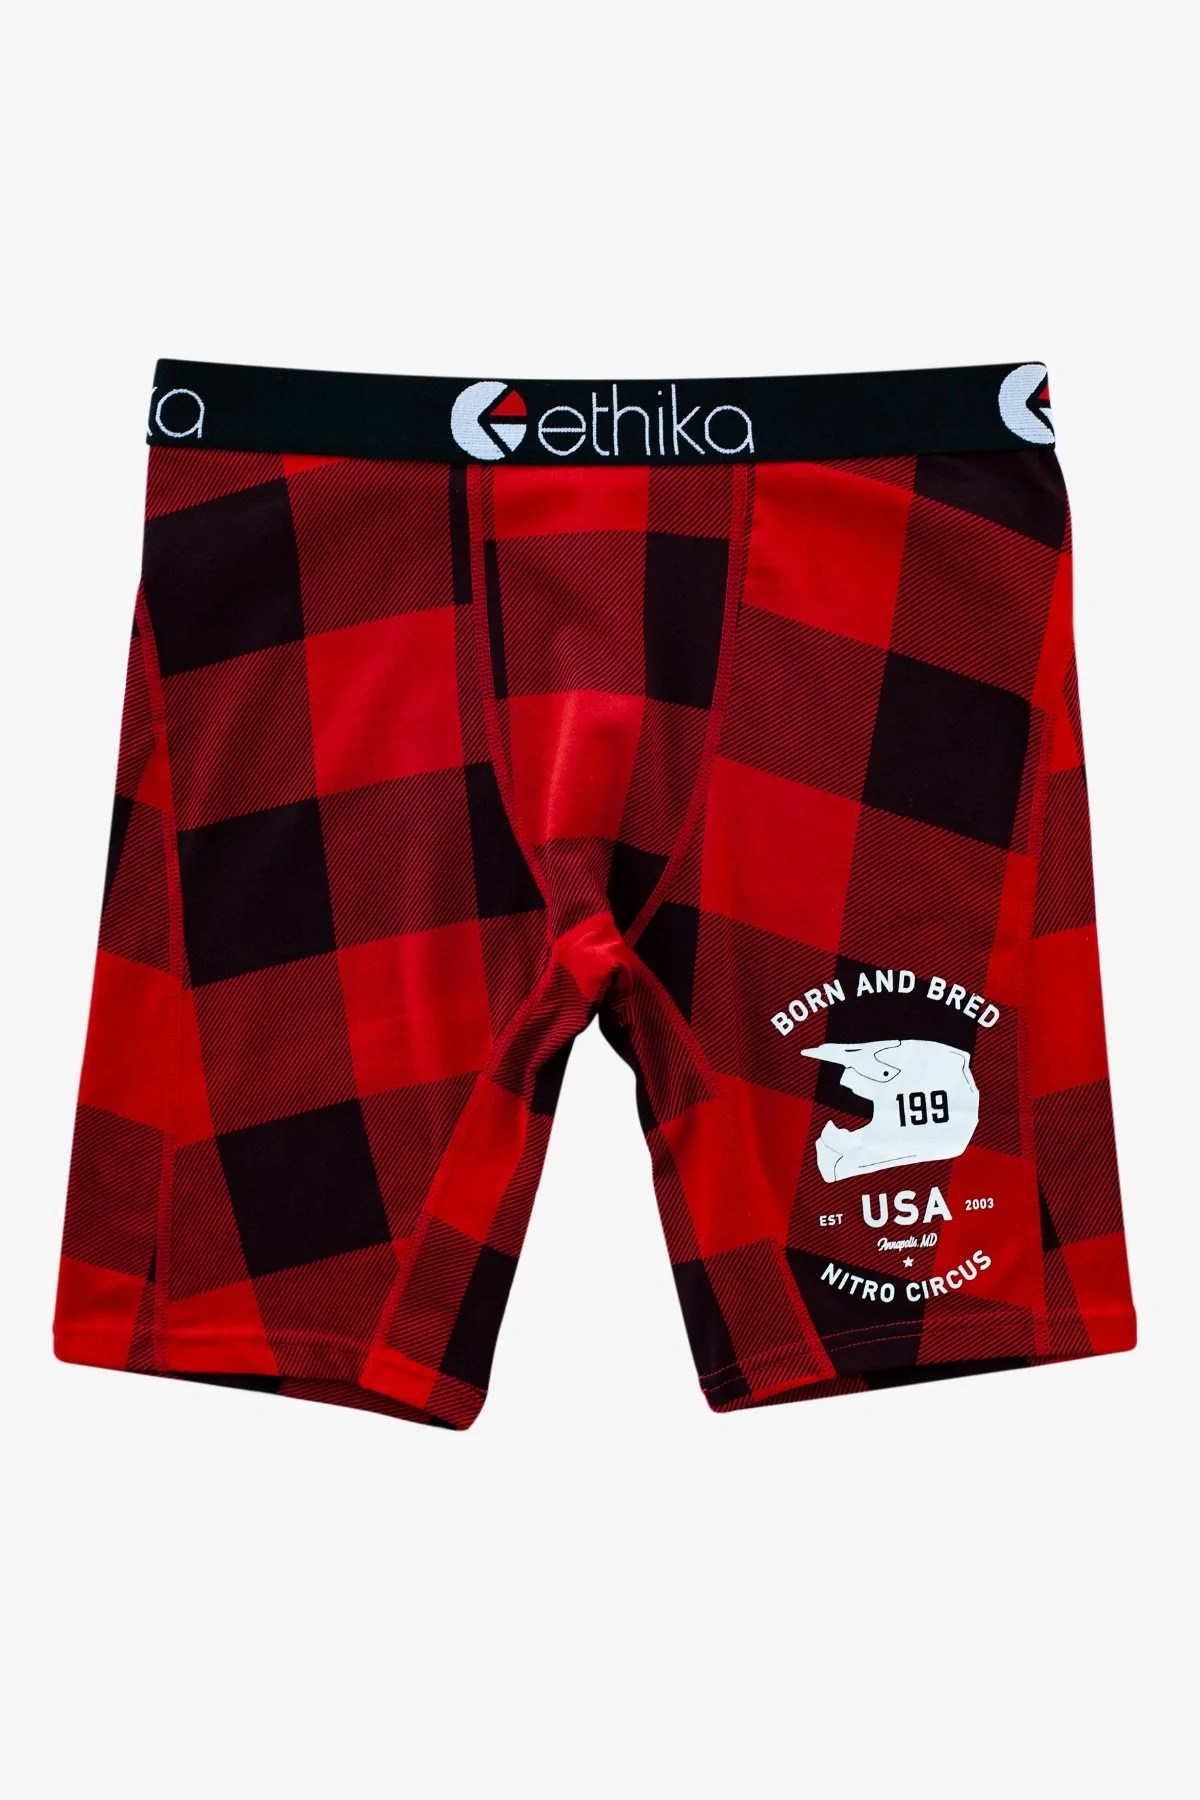 also nitro circus lumberjack men   underwear rh shoptrocircus